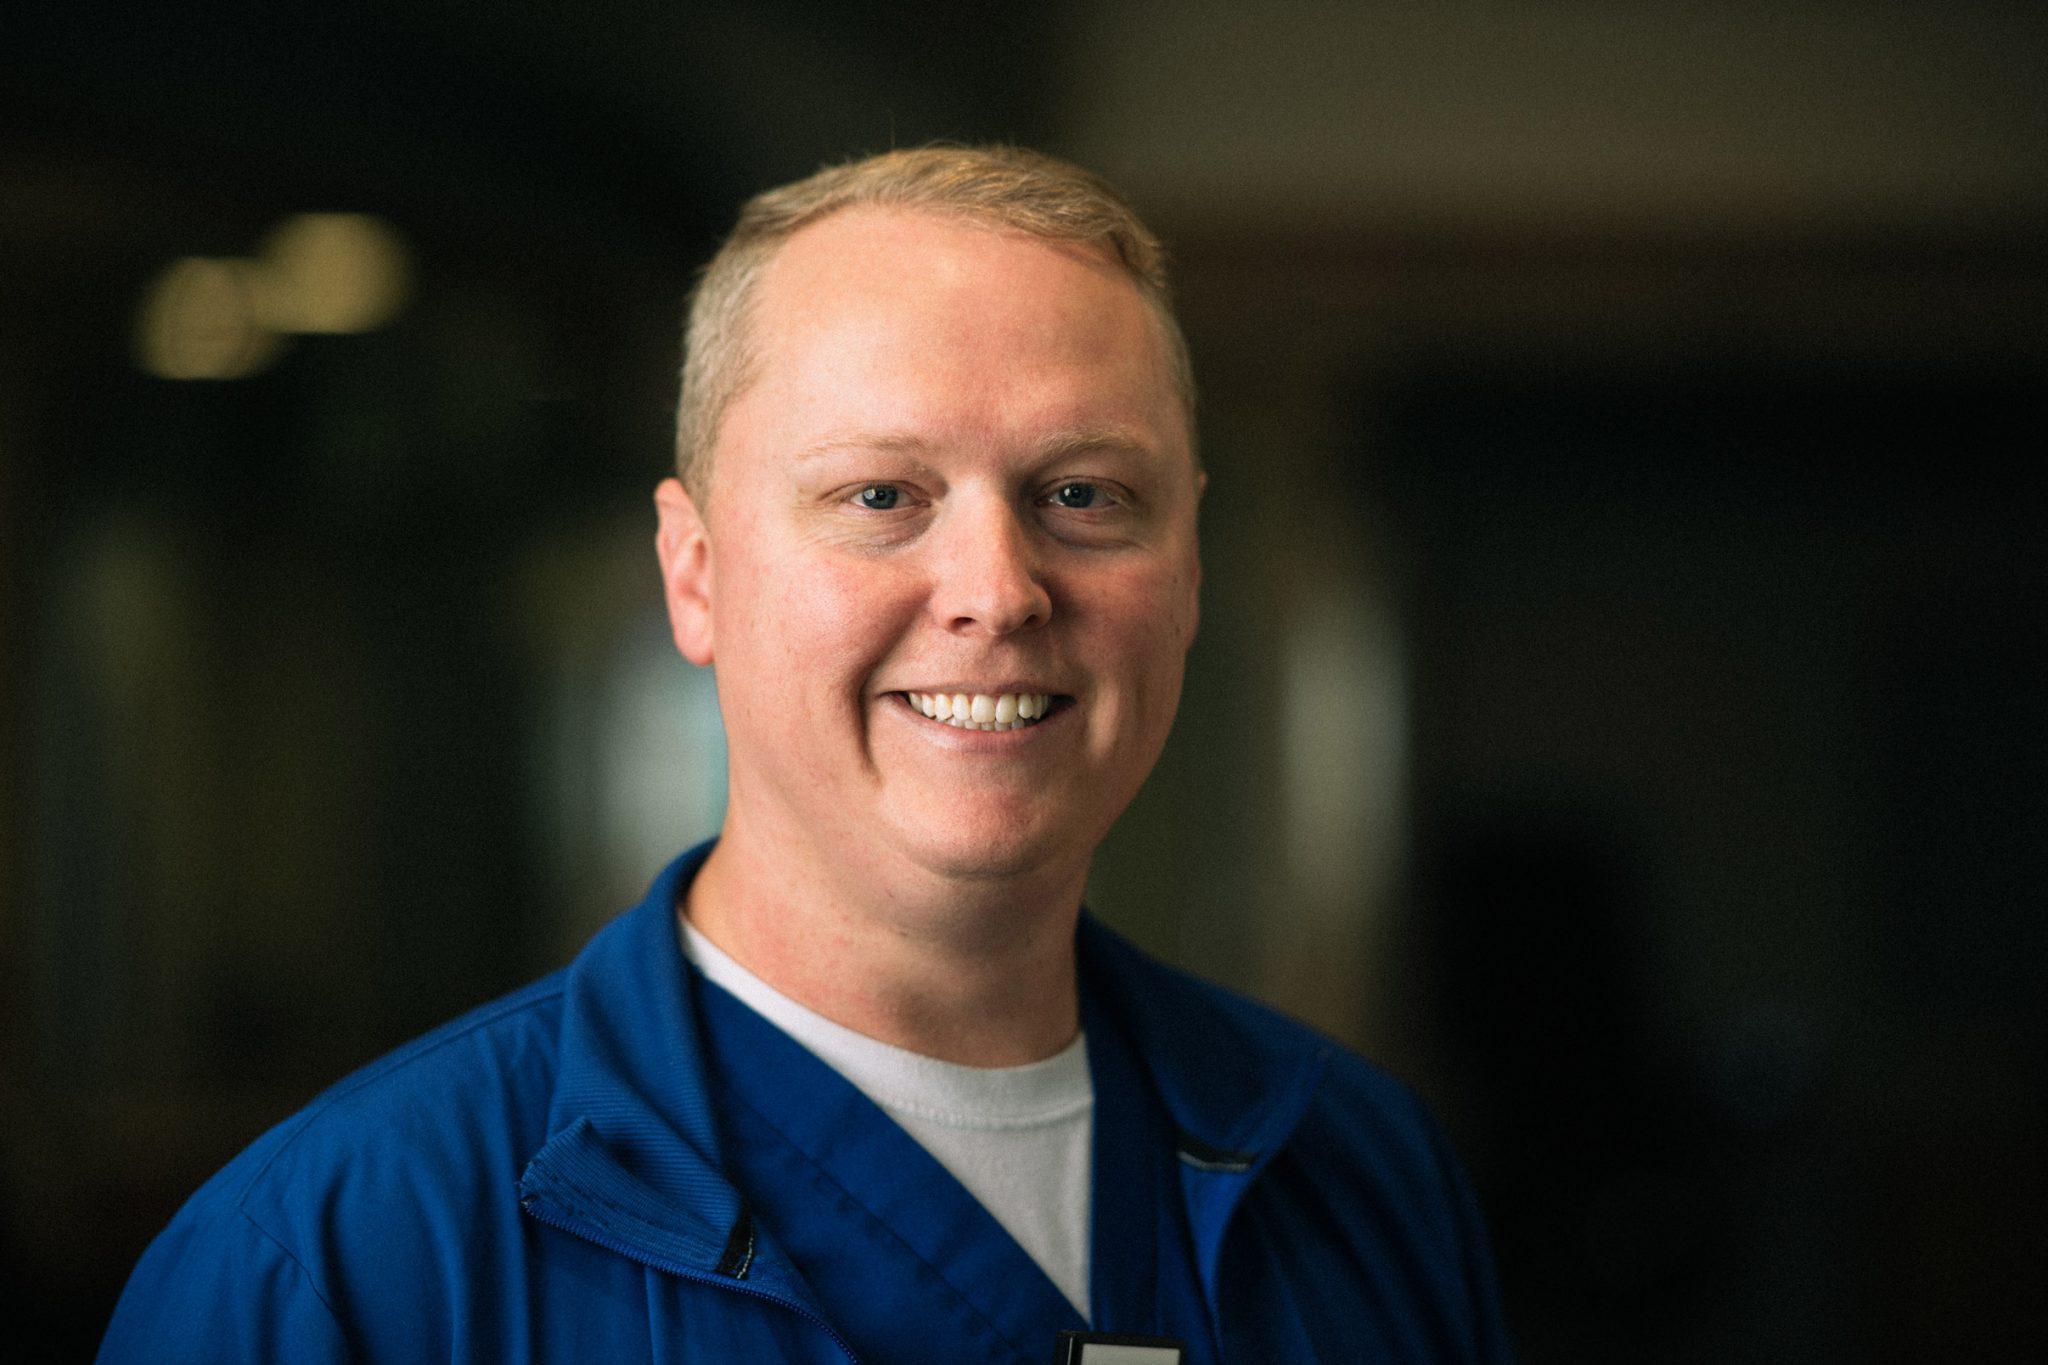 Chris smiles brightly while wearing his blue nursing scrubs.